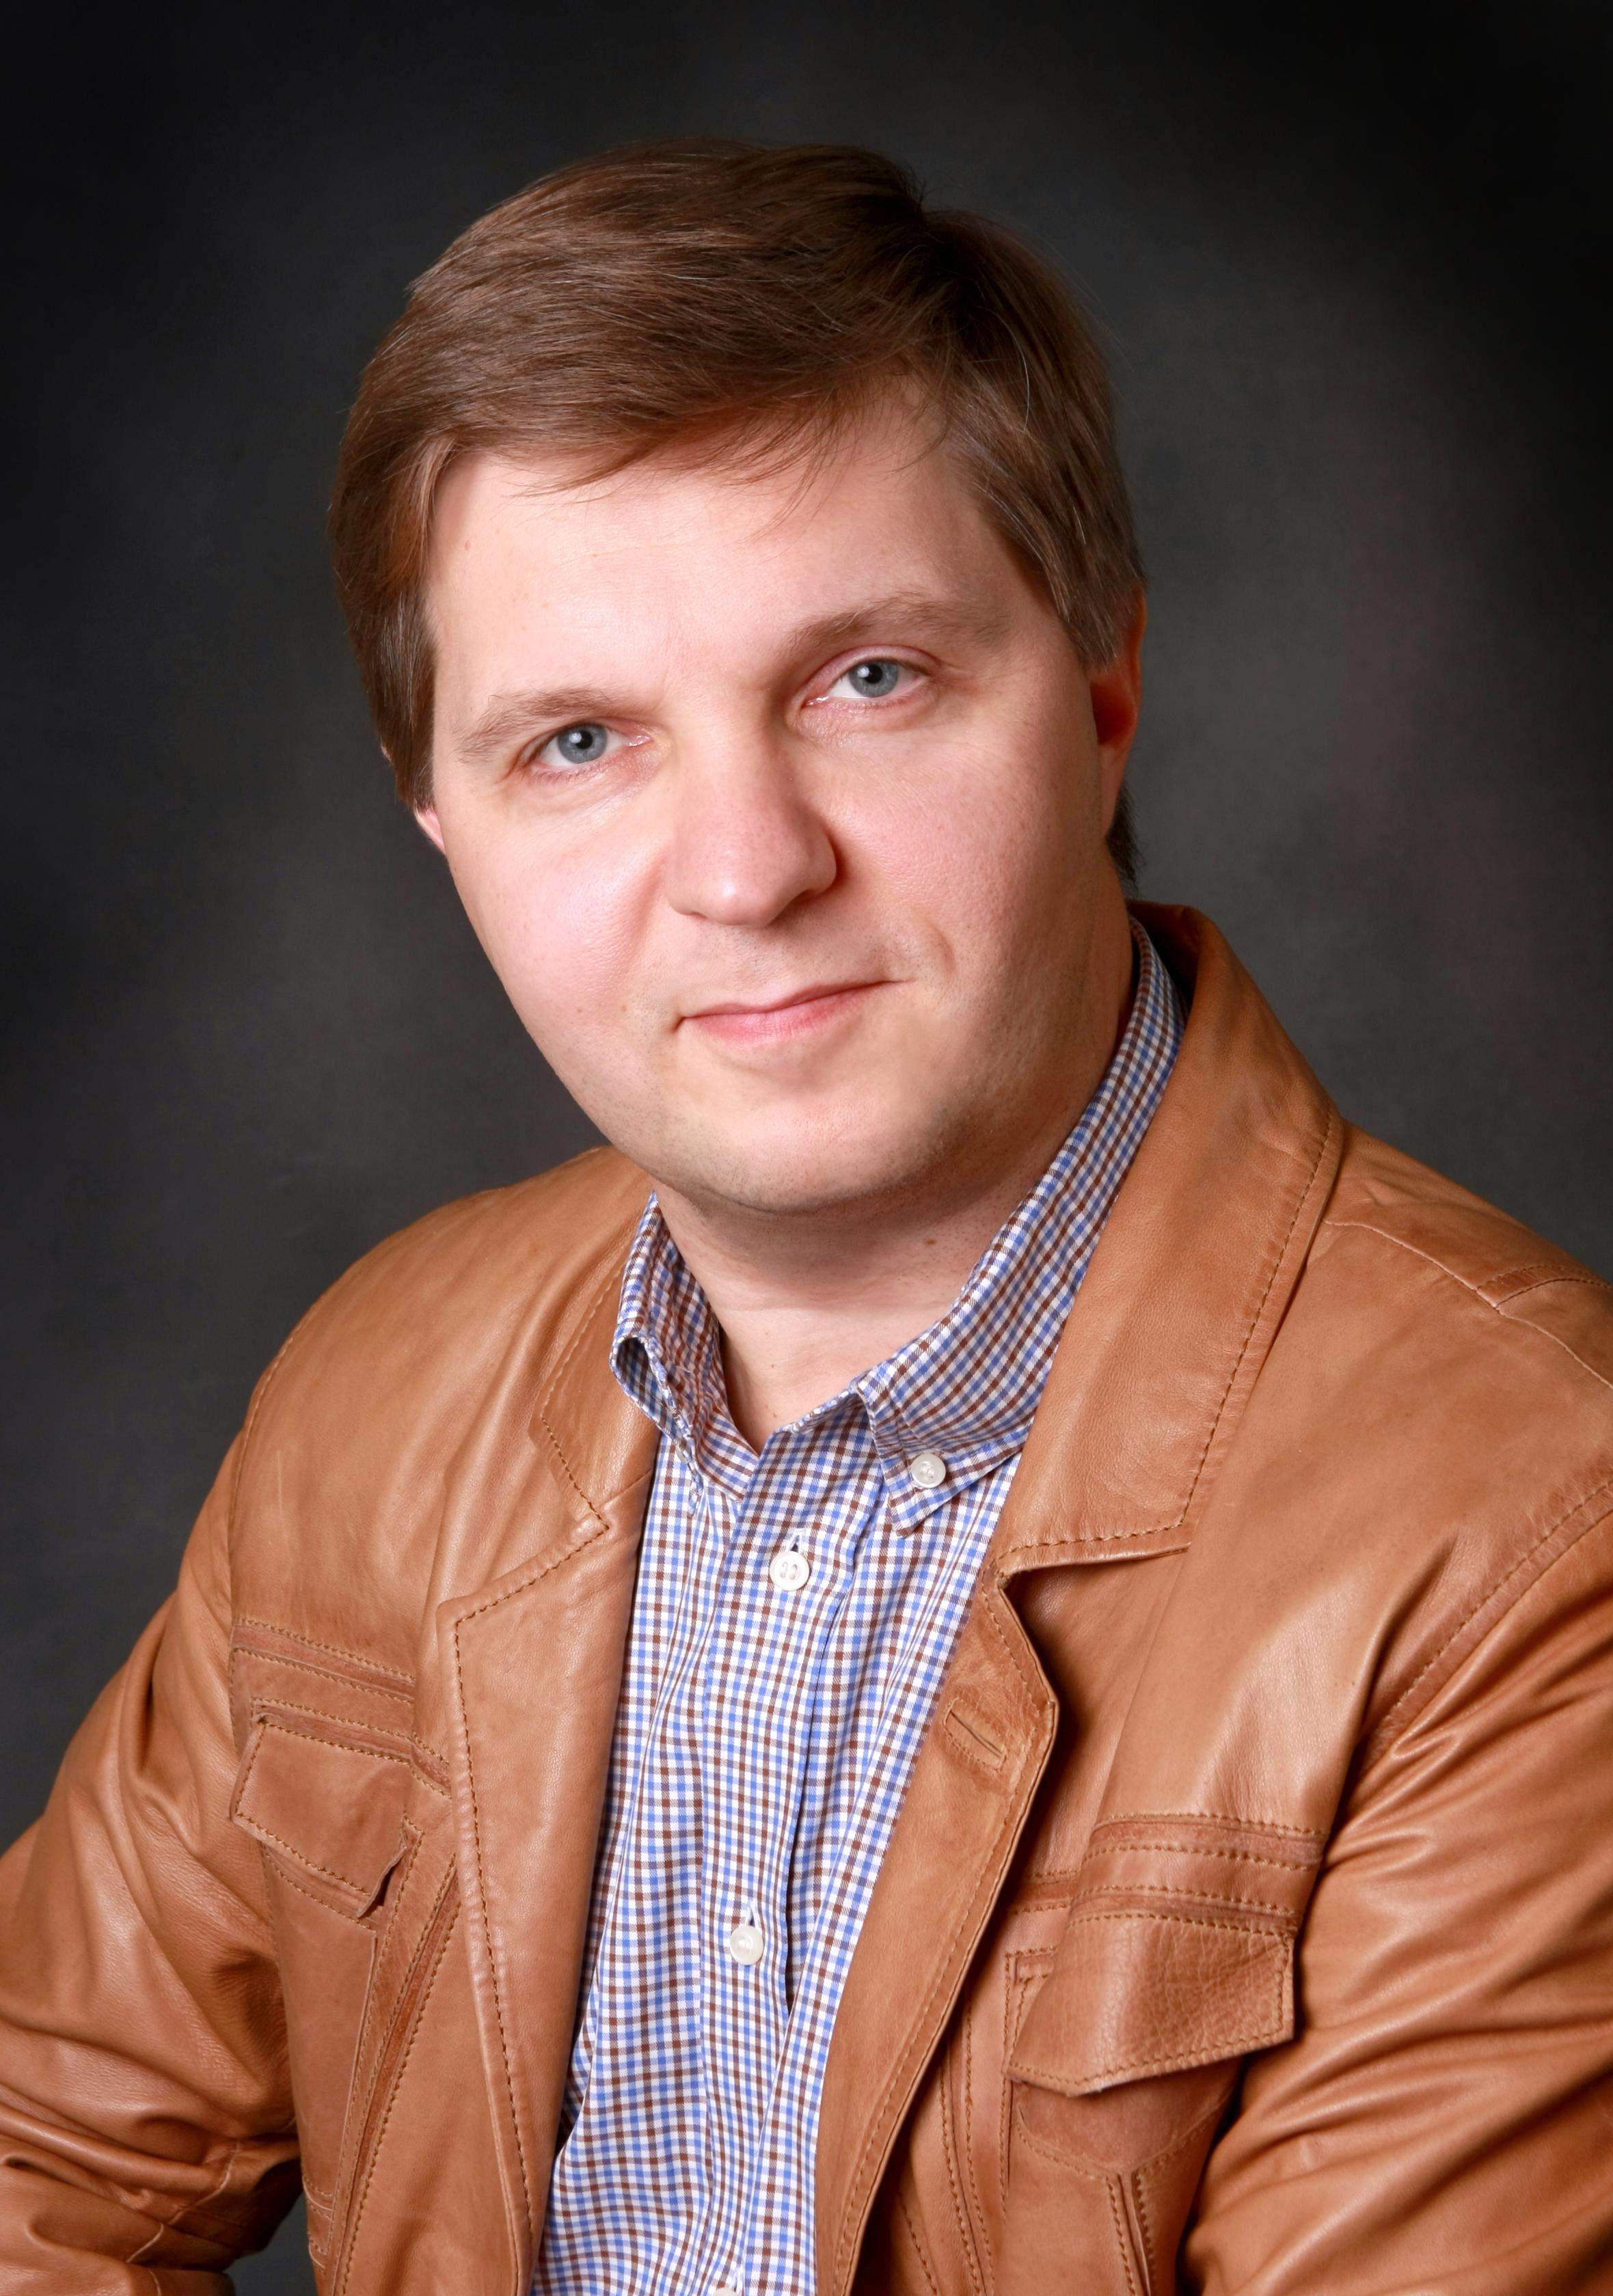 Суетенков Дмитрий Евгеньевич